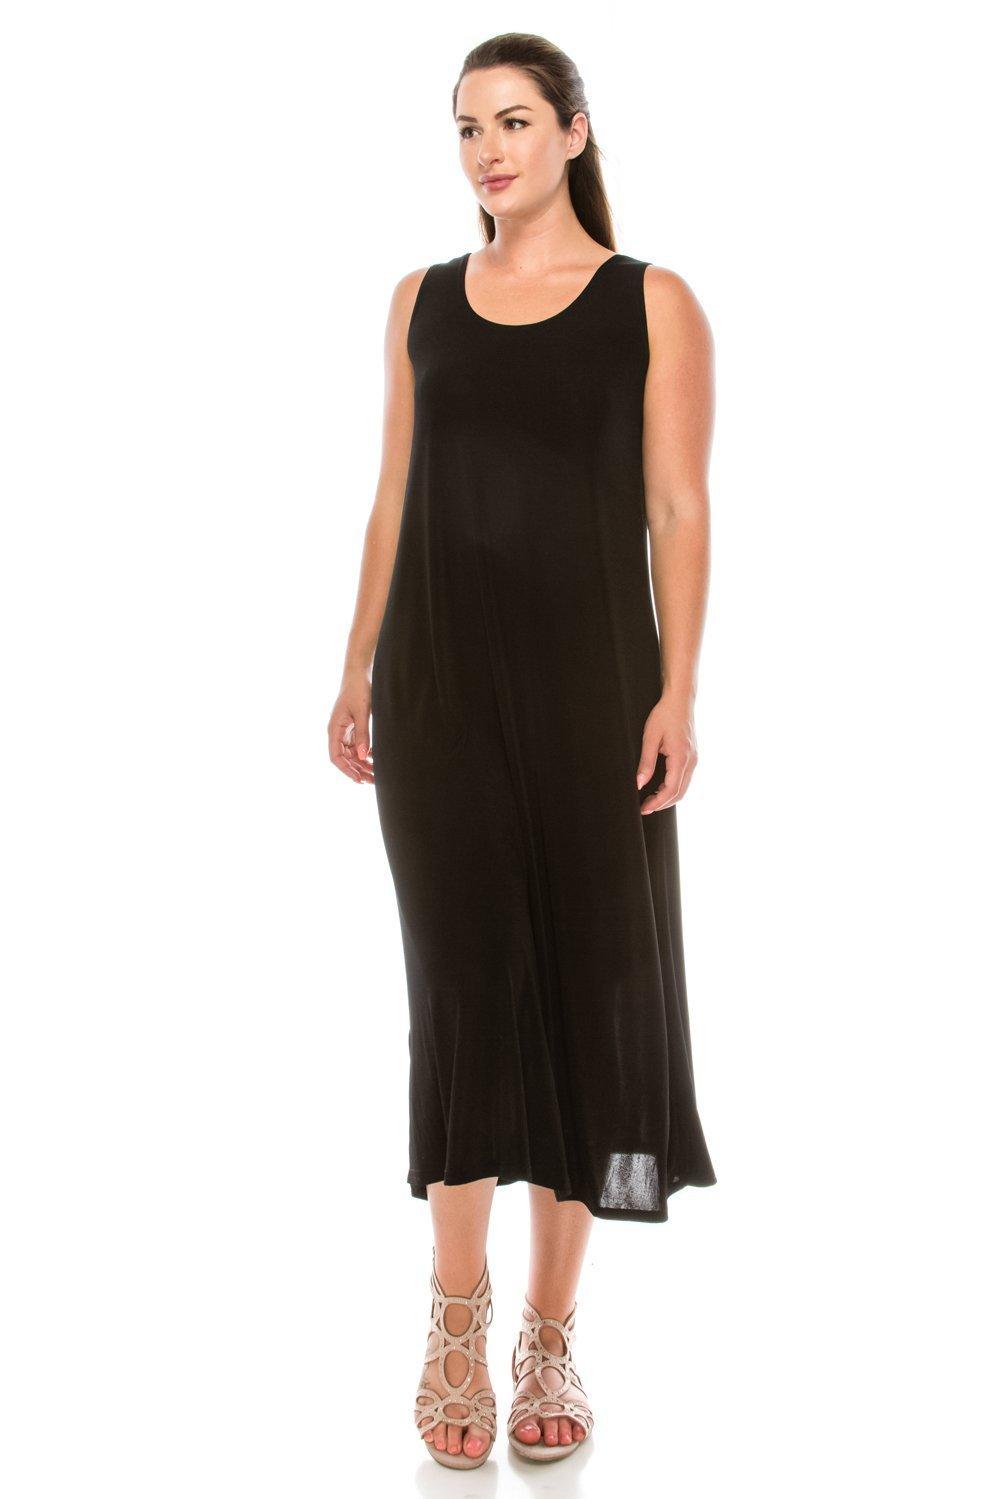 Jostar Stretchy Long Tank Dress in Black Color in Medium Size